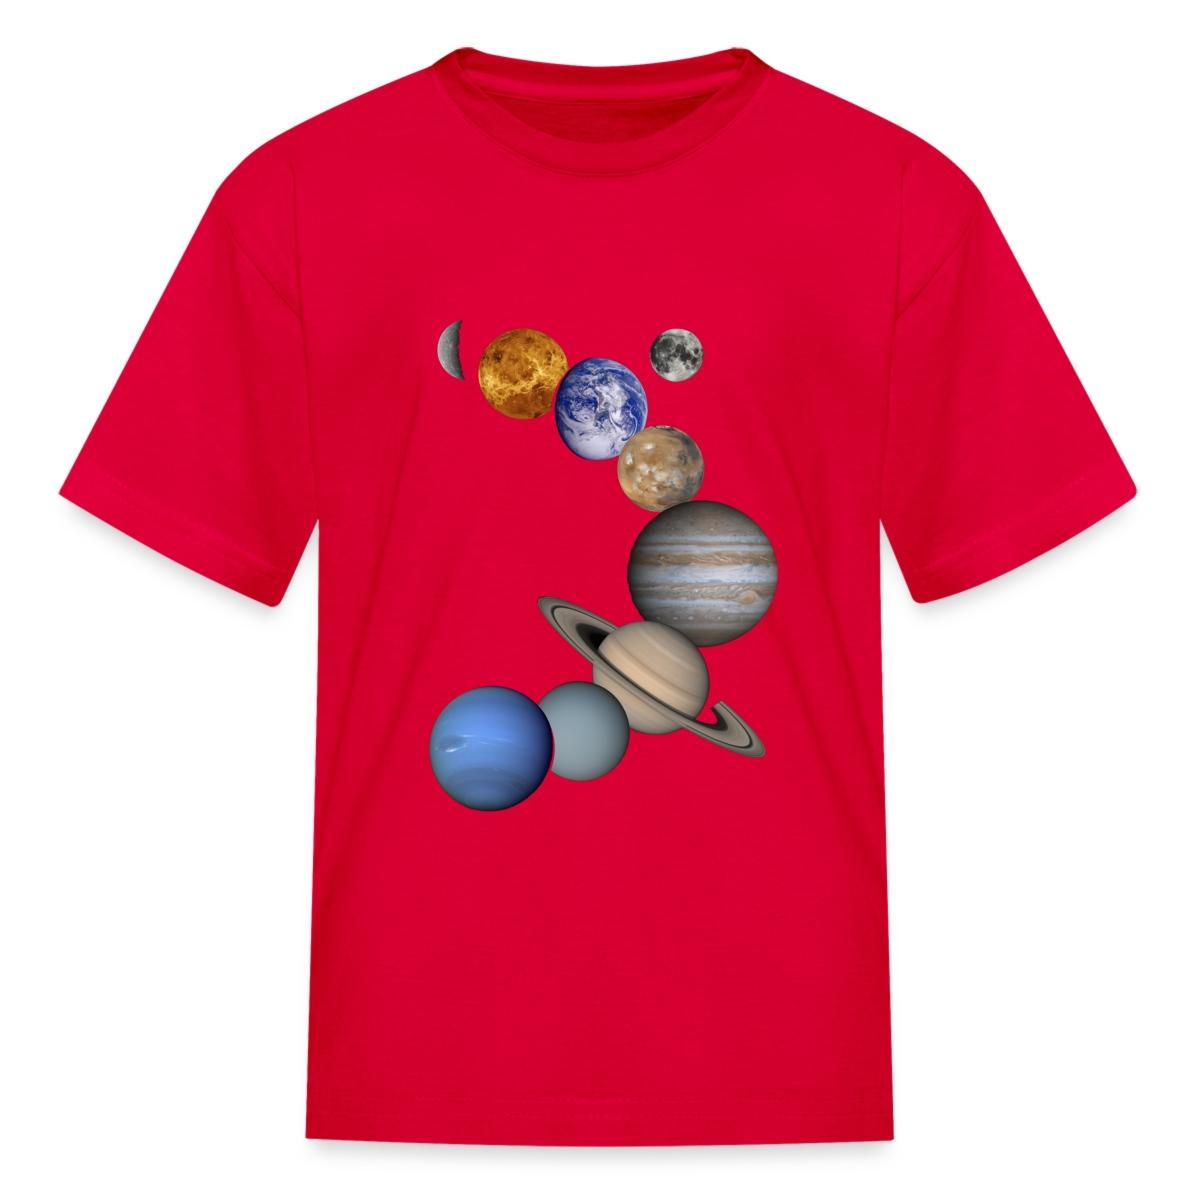 family t shirt solar system - photo #14